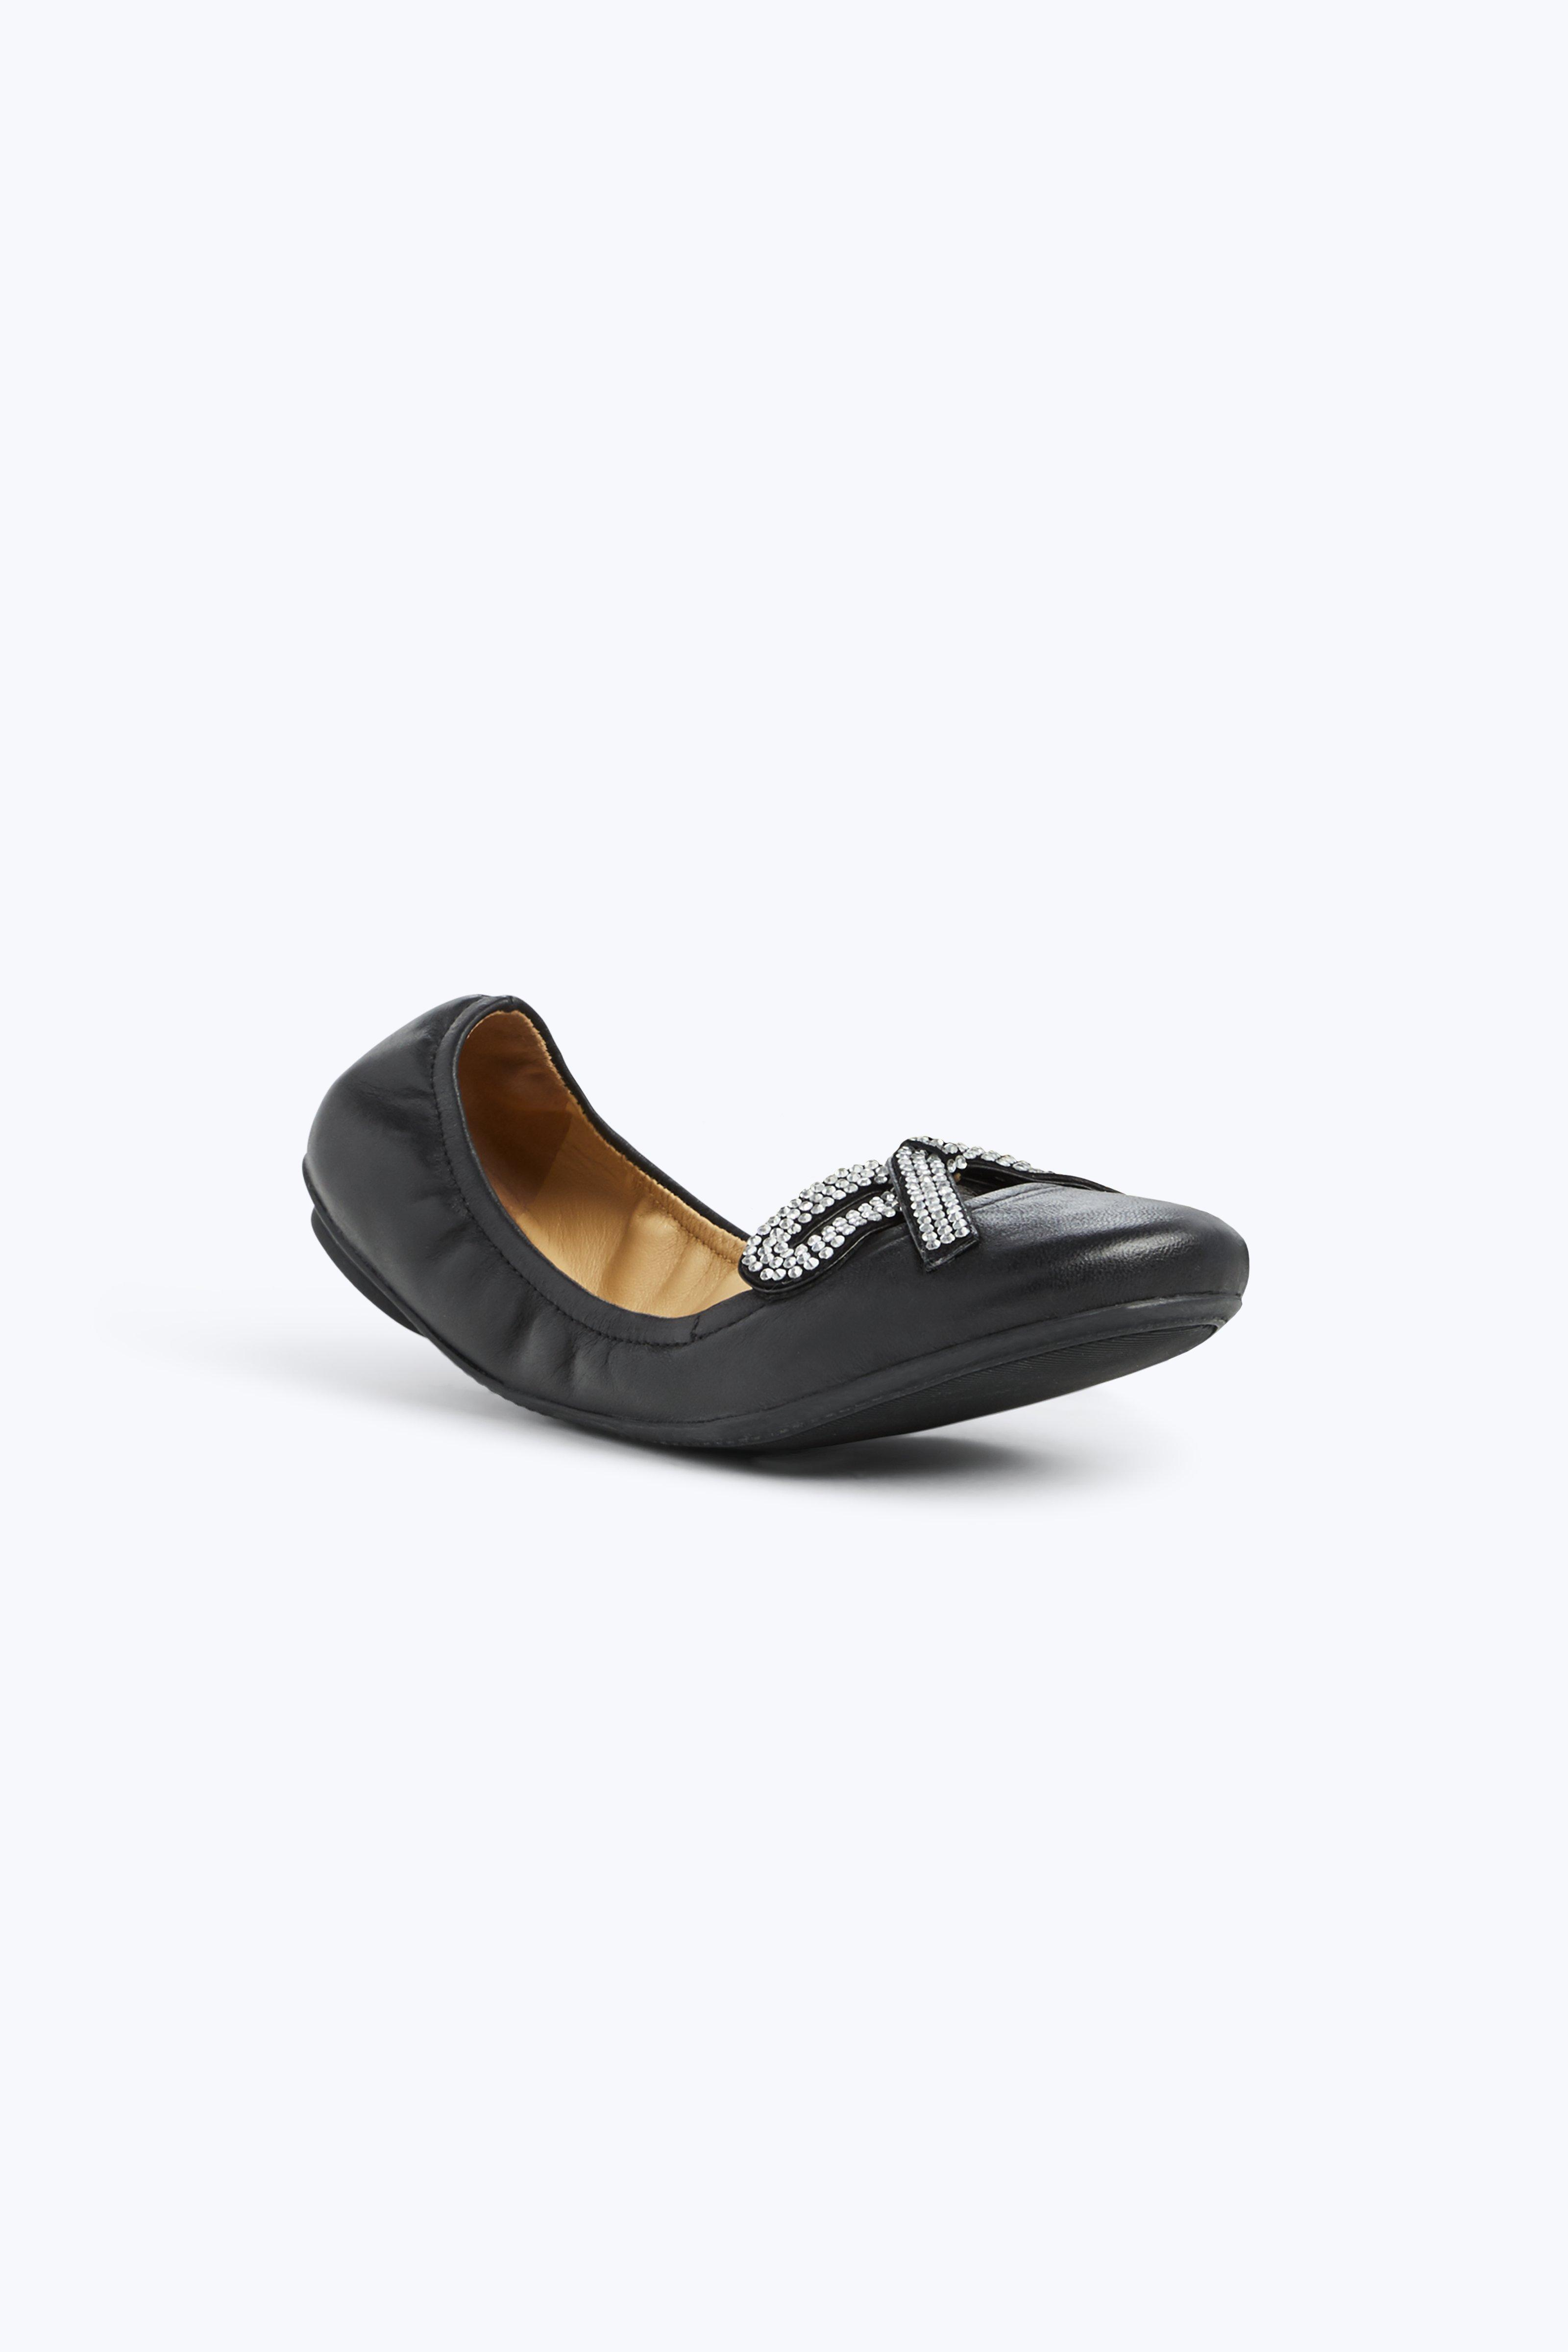 Willa Strass Leather Ballet Flats, Black